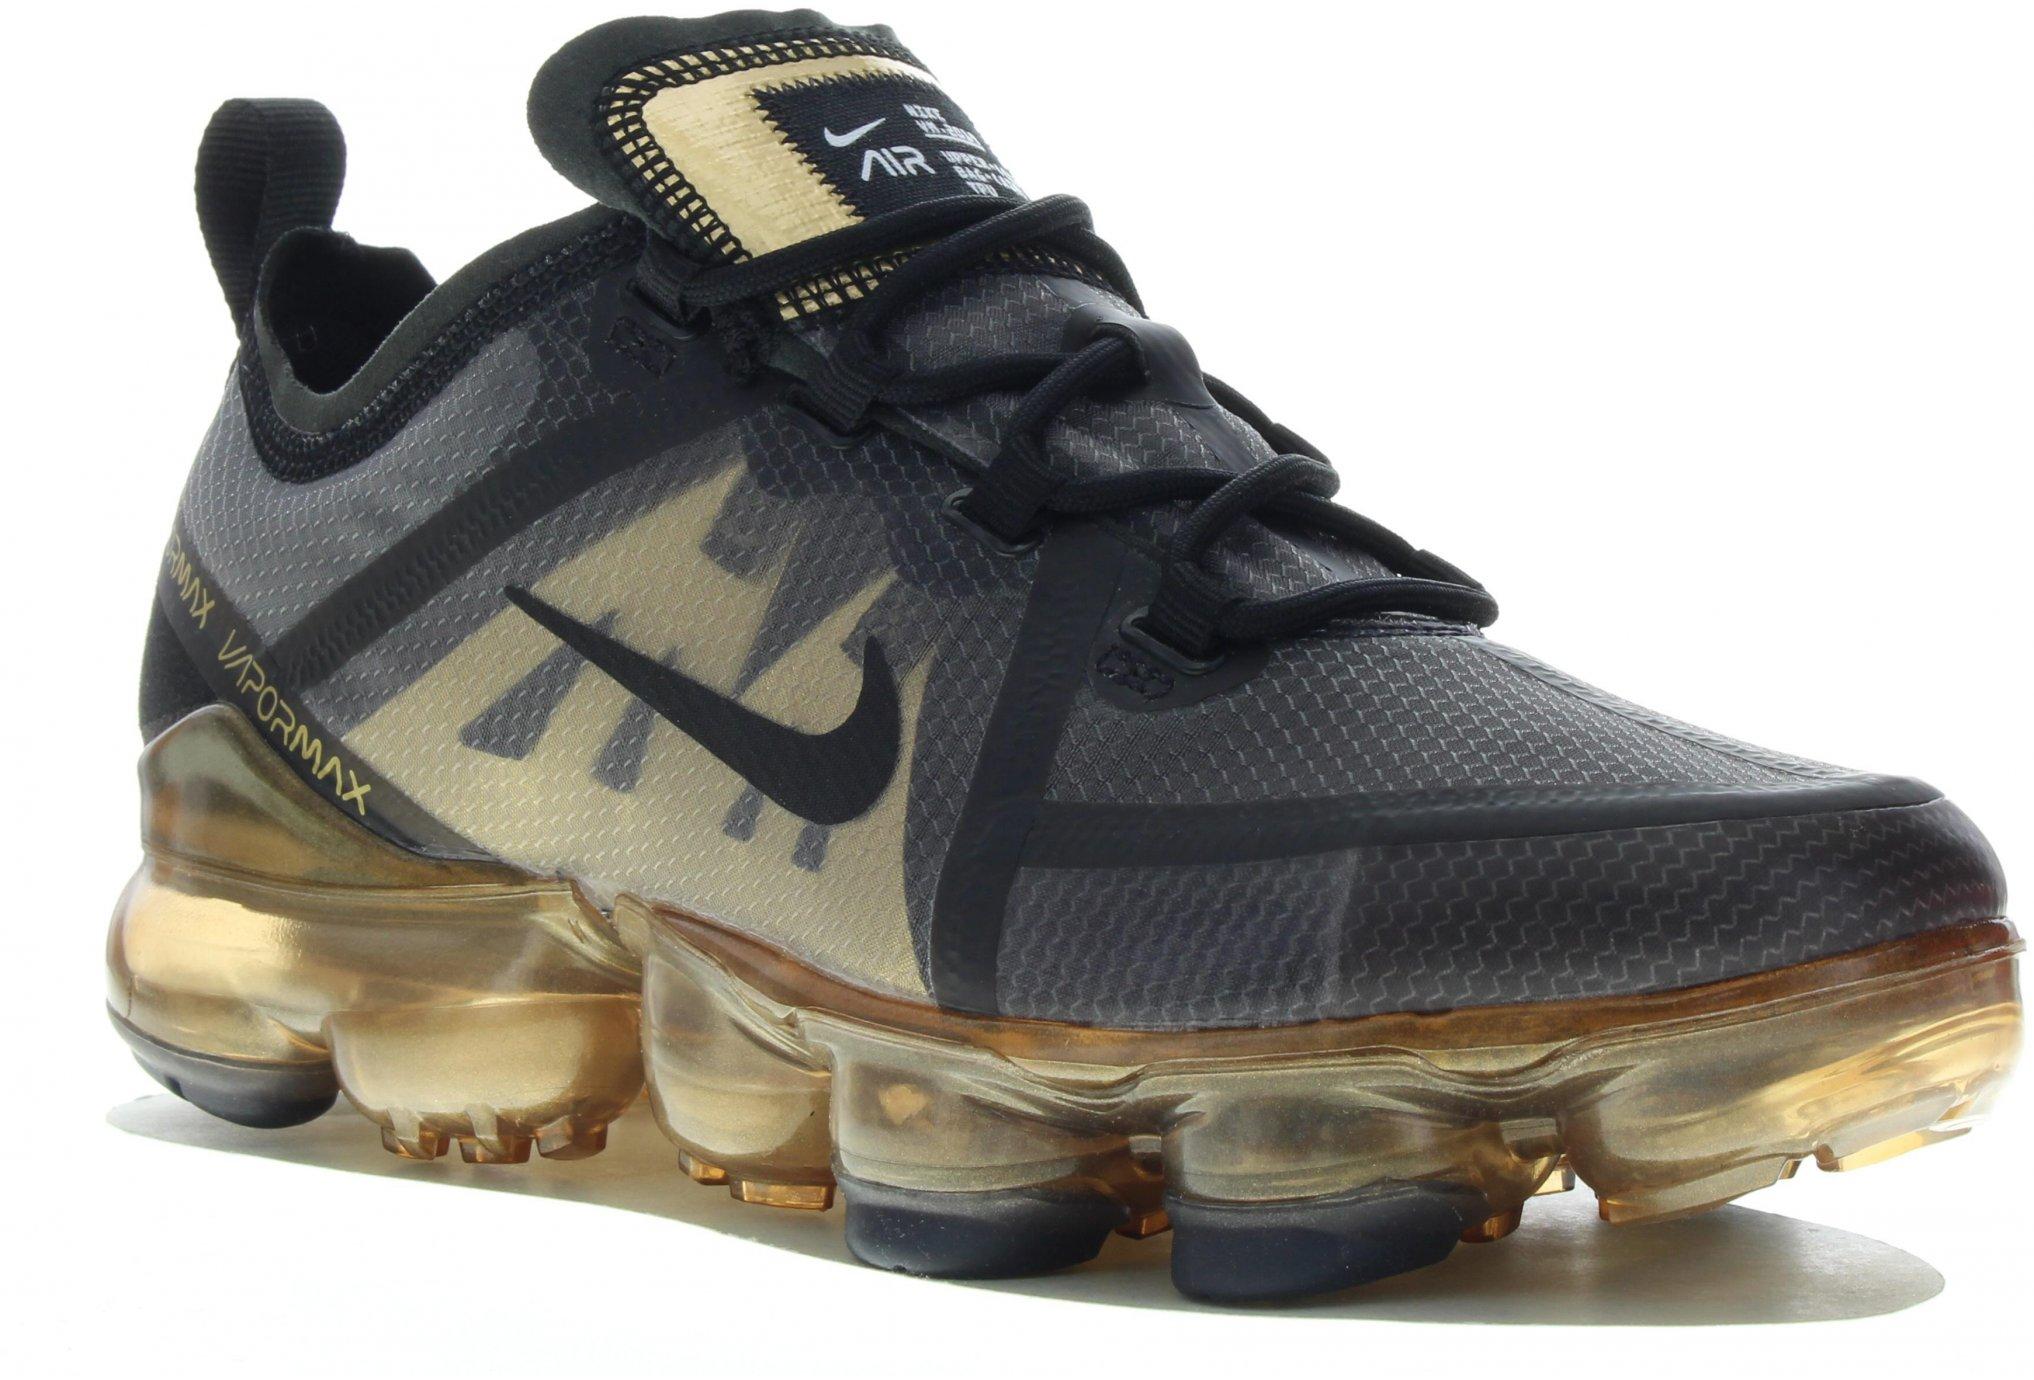 dcaf31383 Nike Air Max Trainer 1 M homme Kaki pas cher